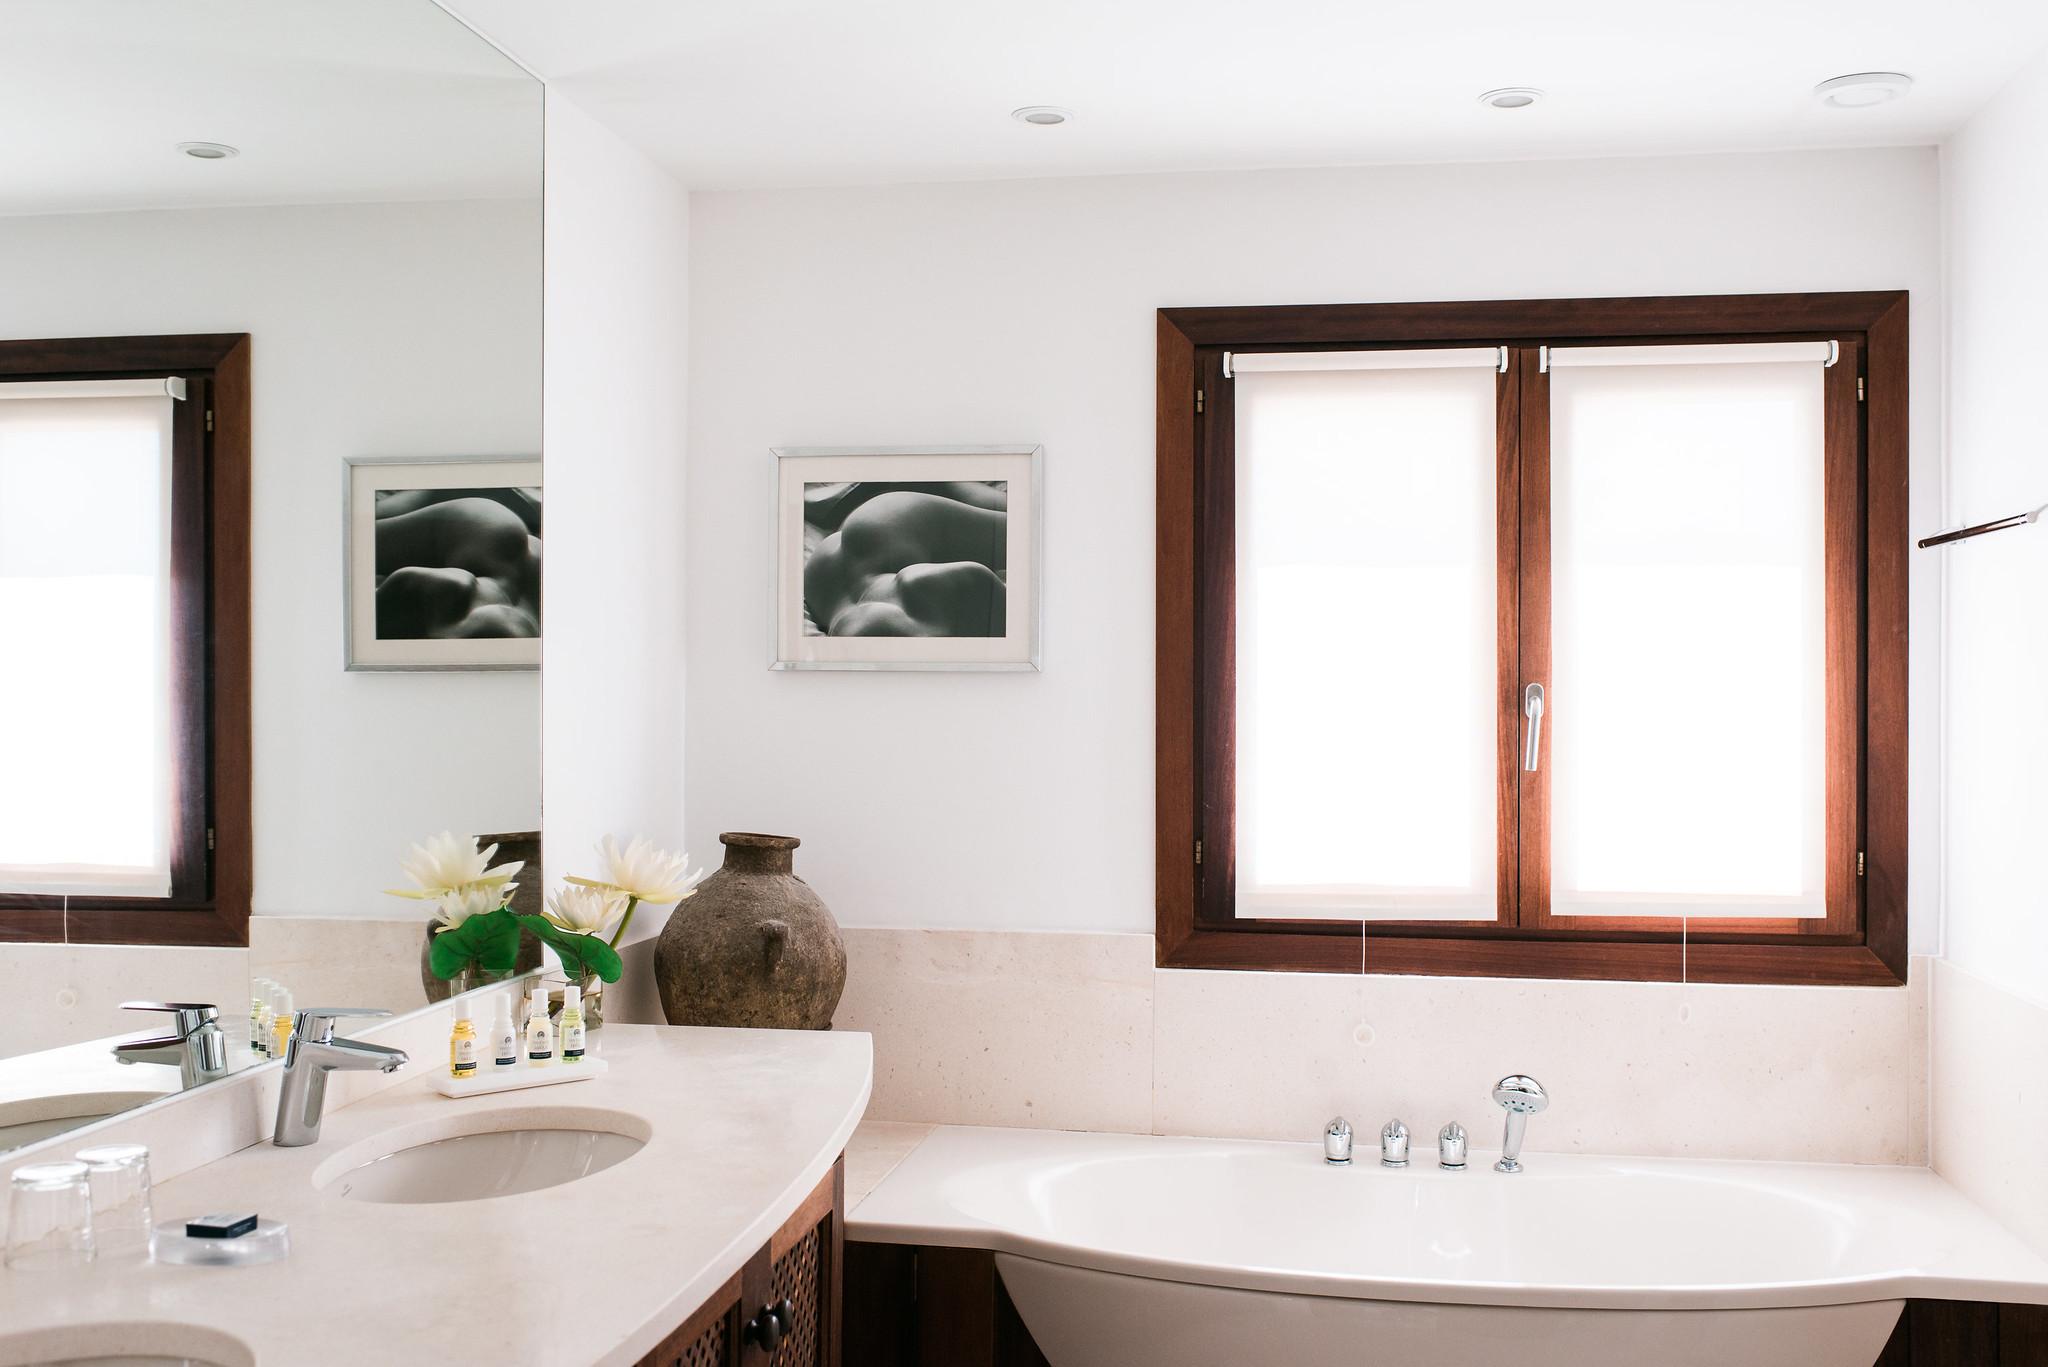 https://www.white-ibiza.com/wp-content/uploads/2020/05/white-ibiza-villas-can-ava-bathroom.jpg